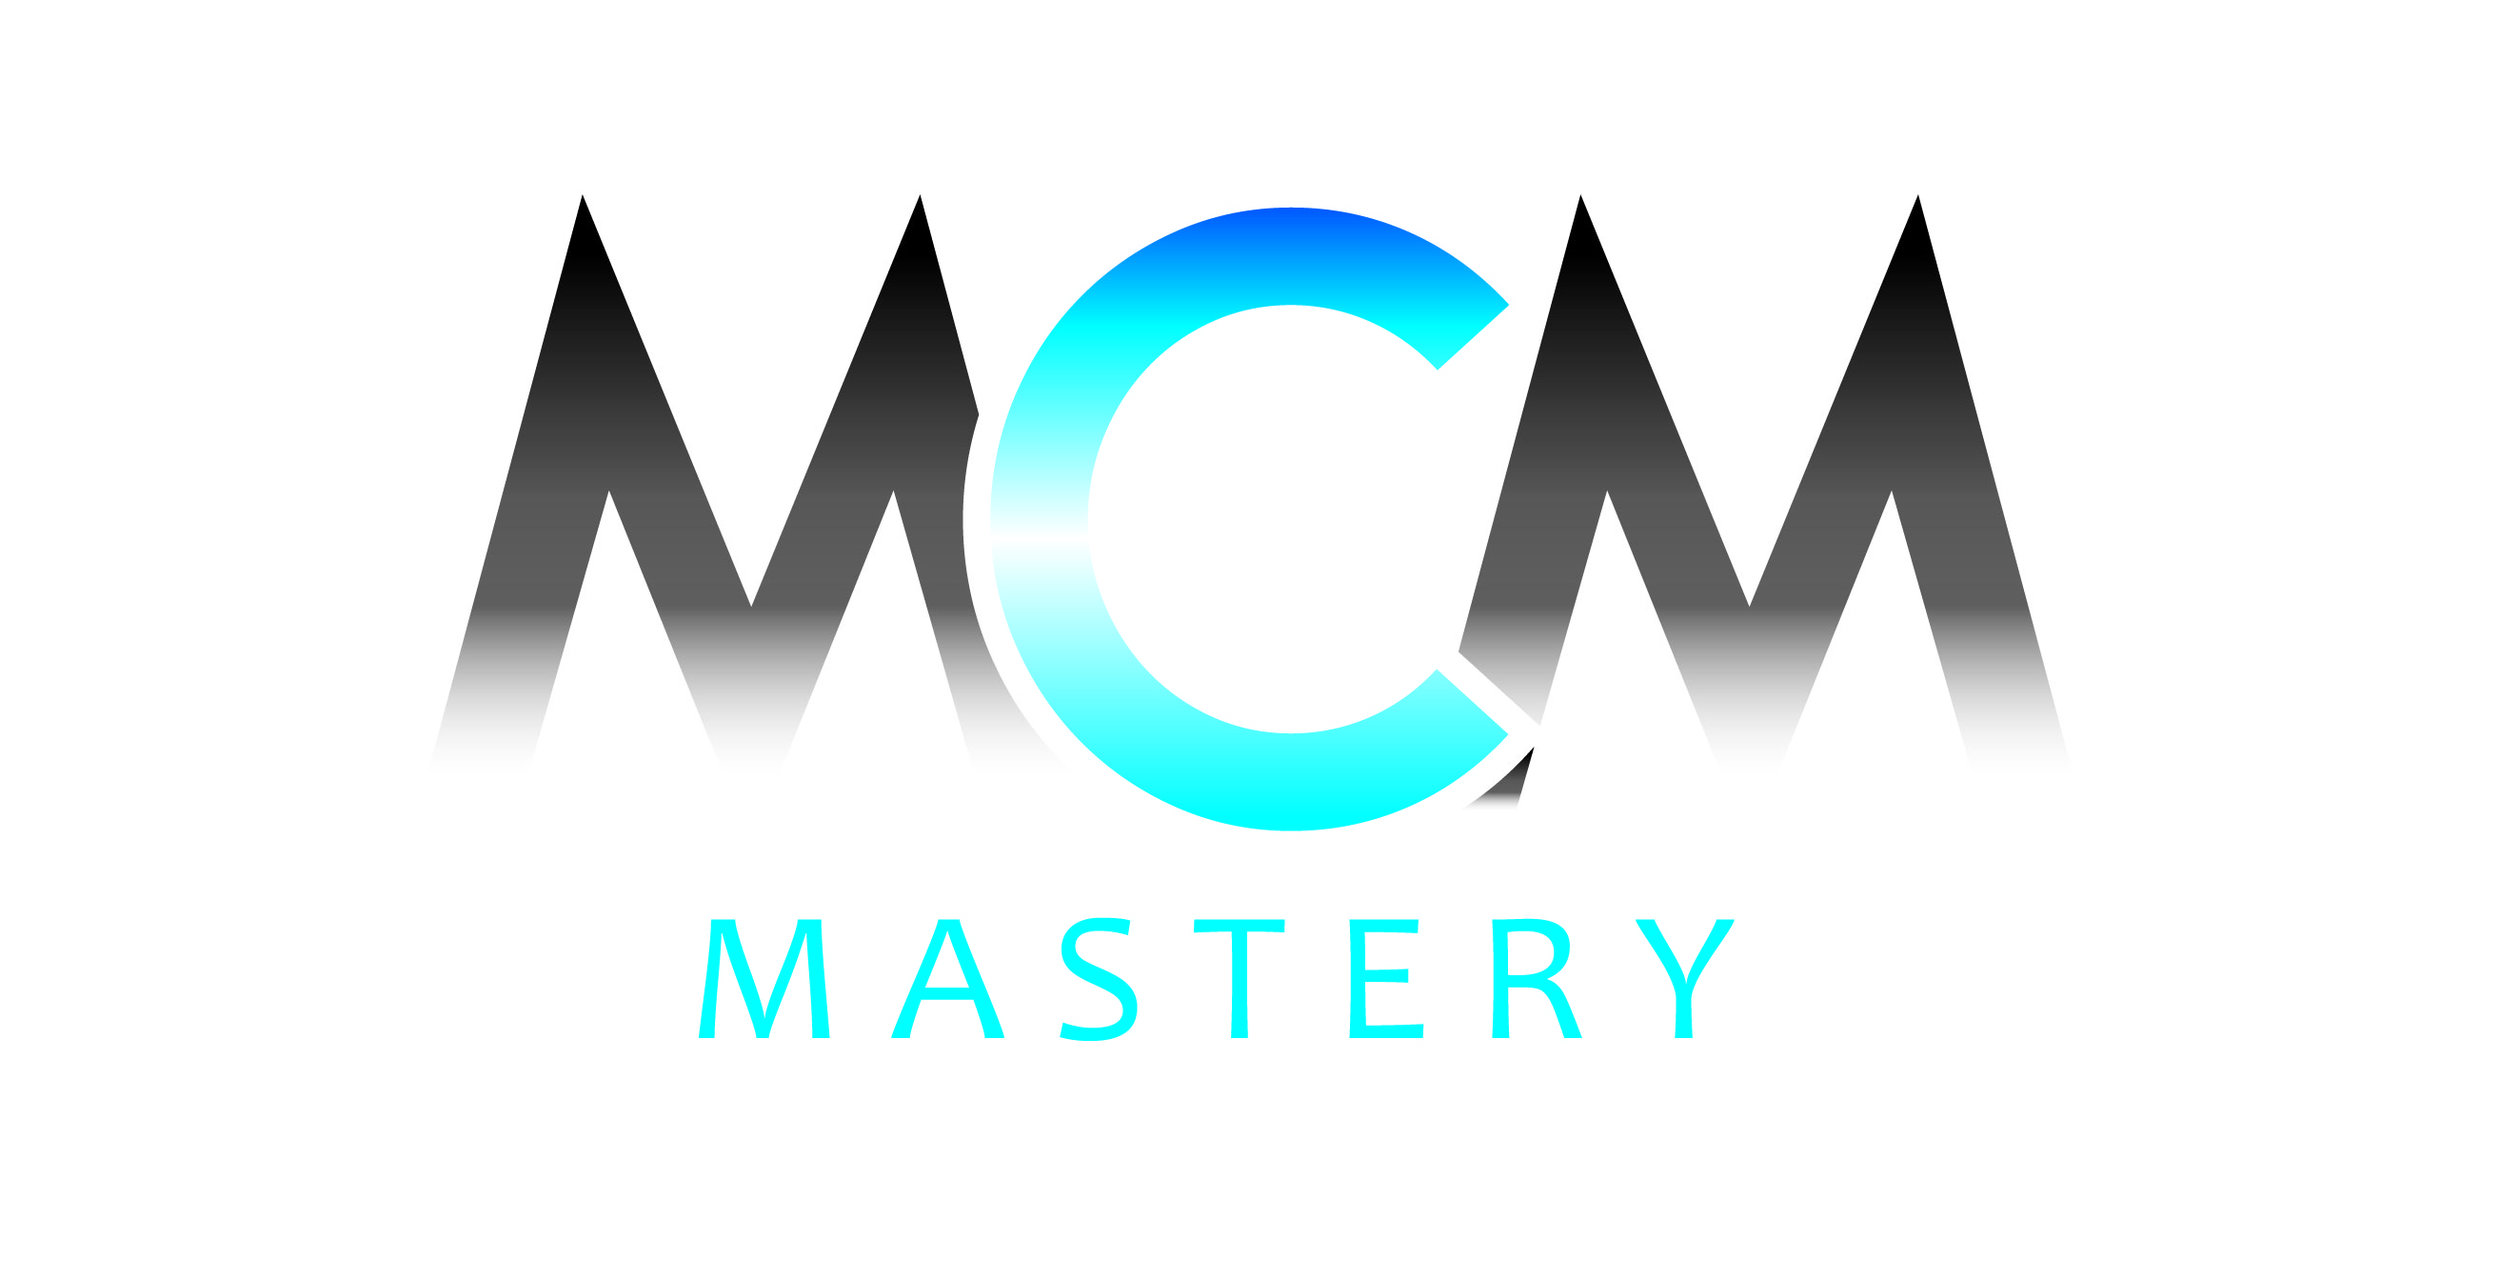 MCM_mastery-01.jpg